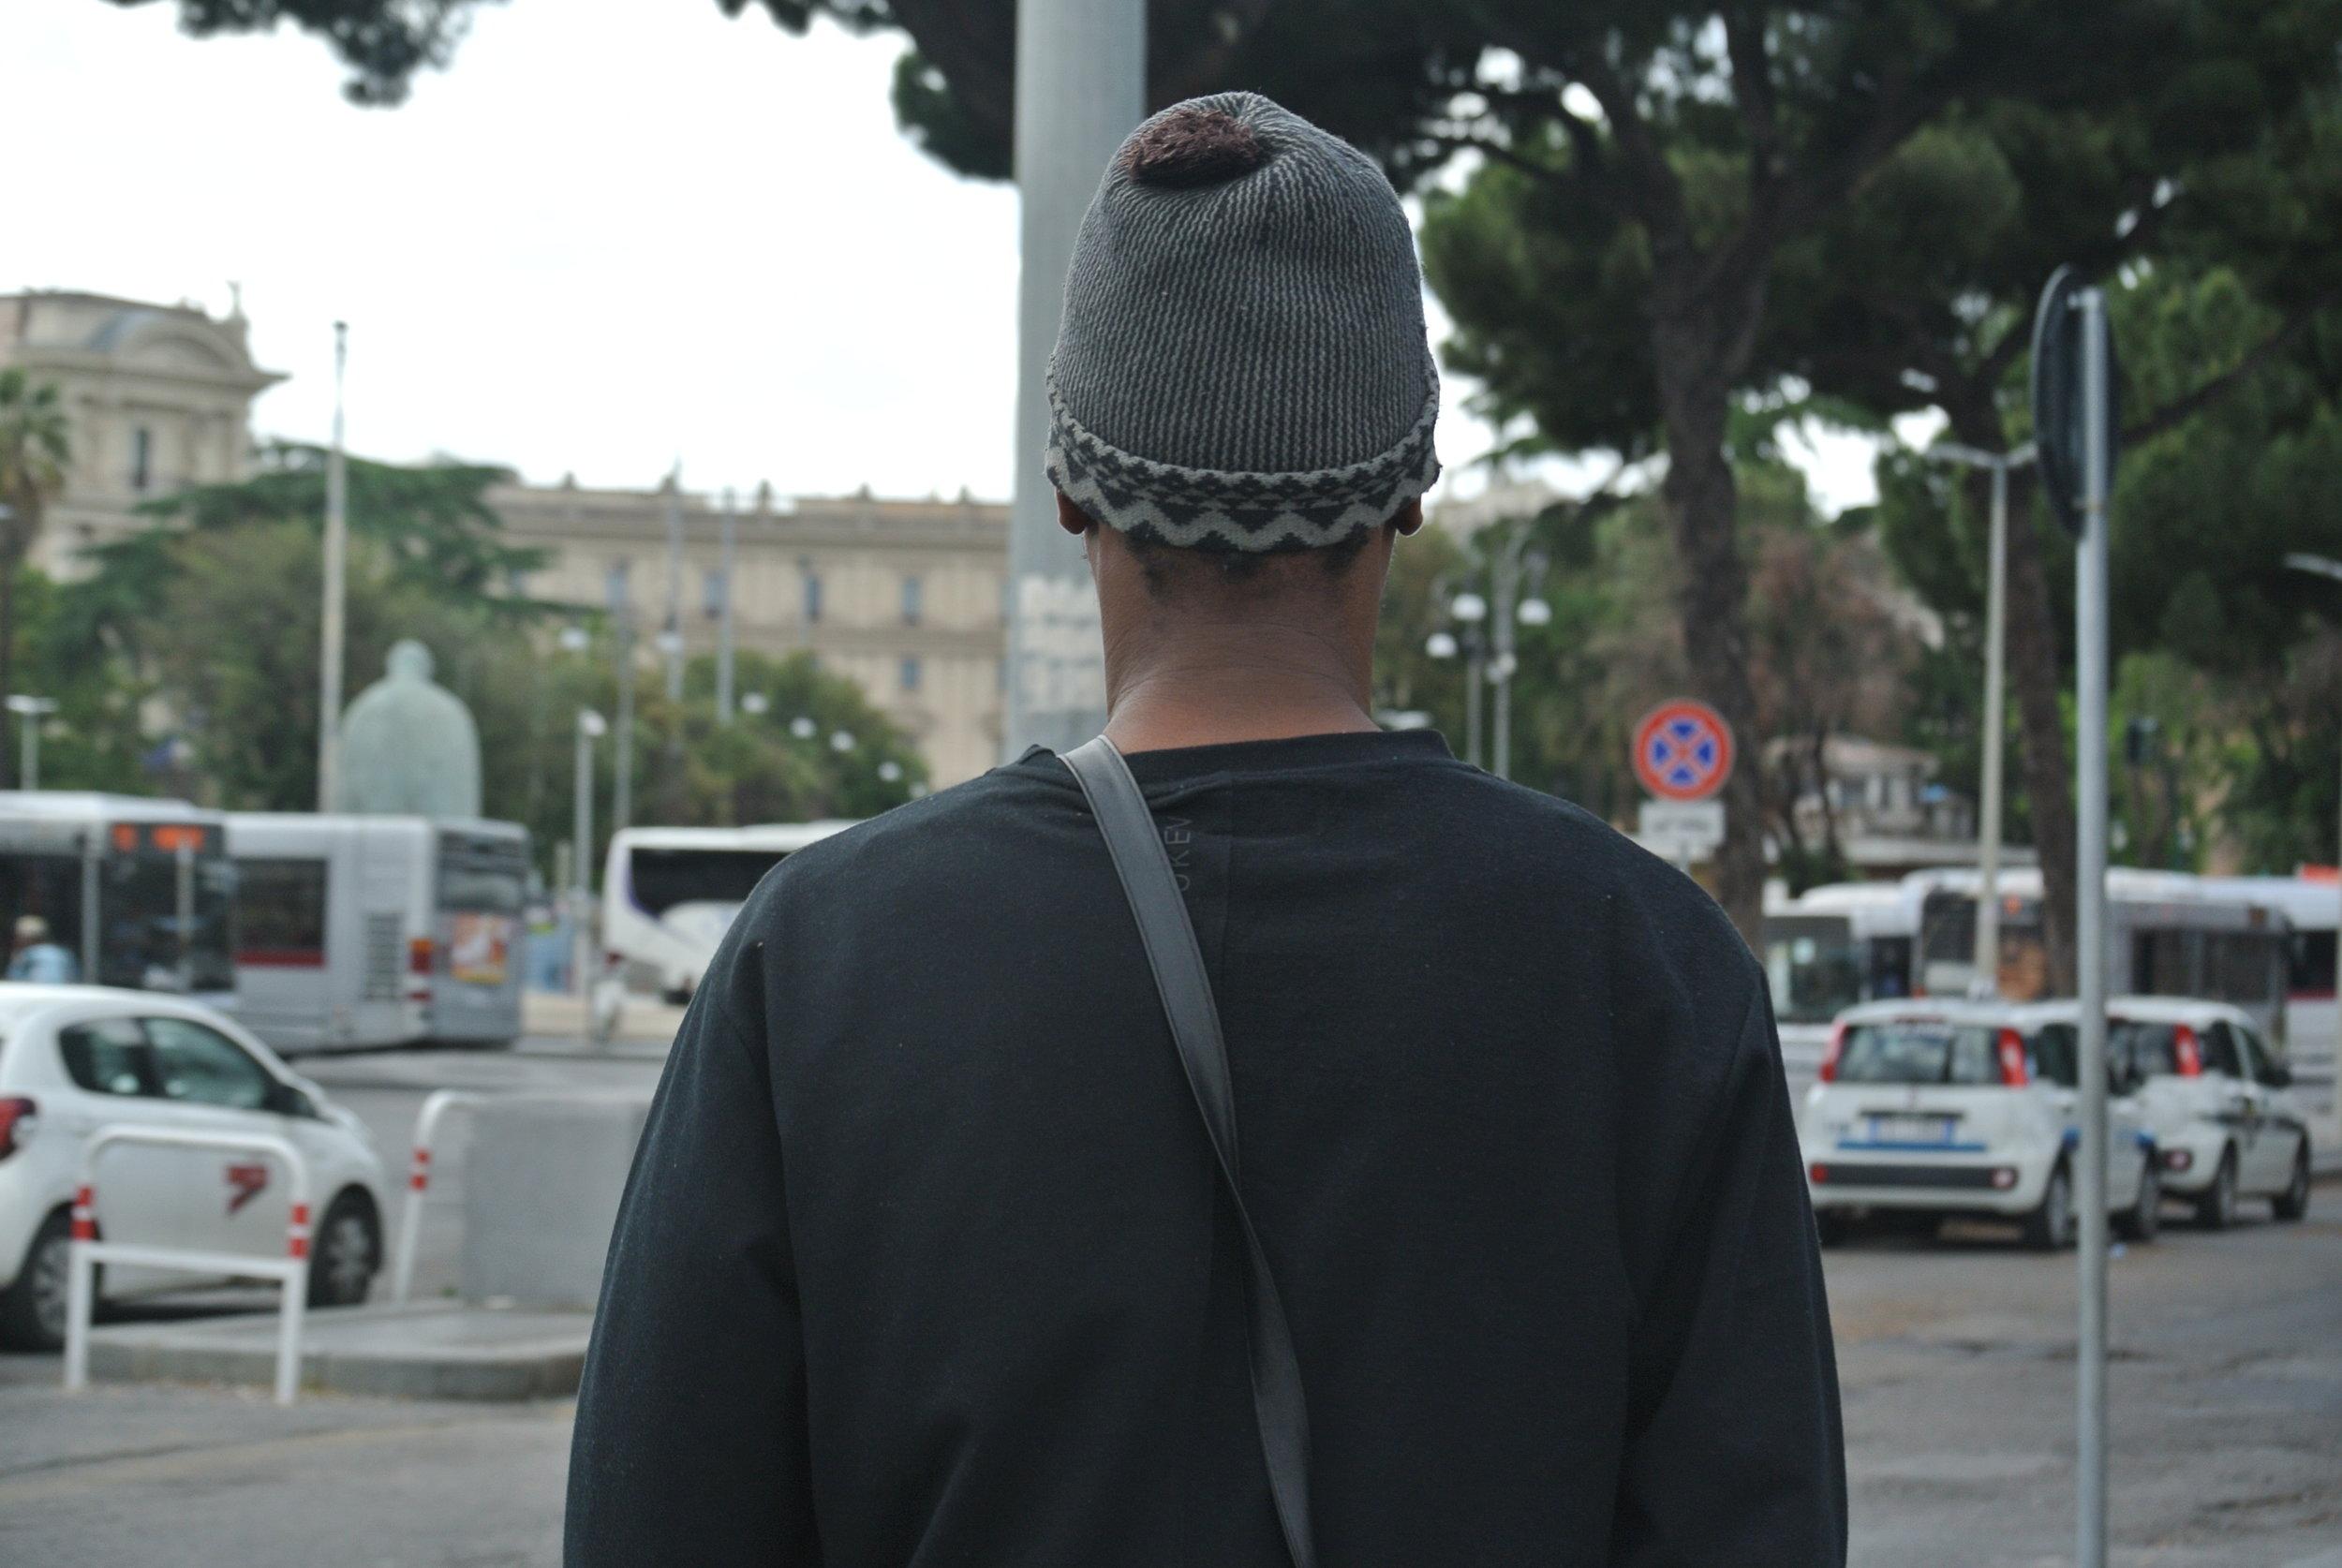 Ali outside Roma Termini station, May 2018. © Pamela Kerpius